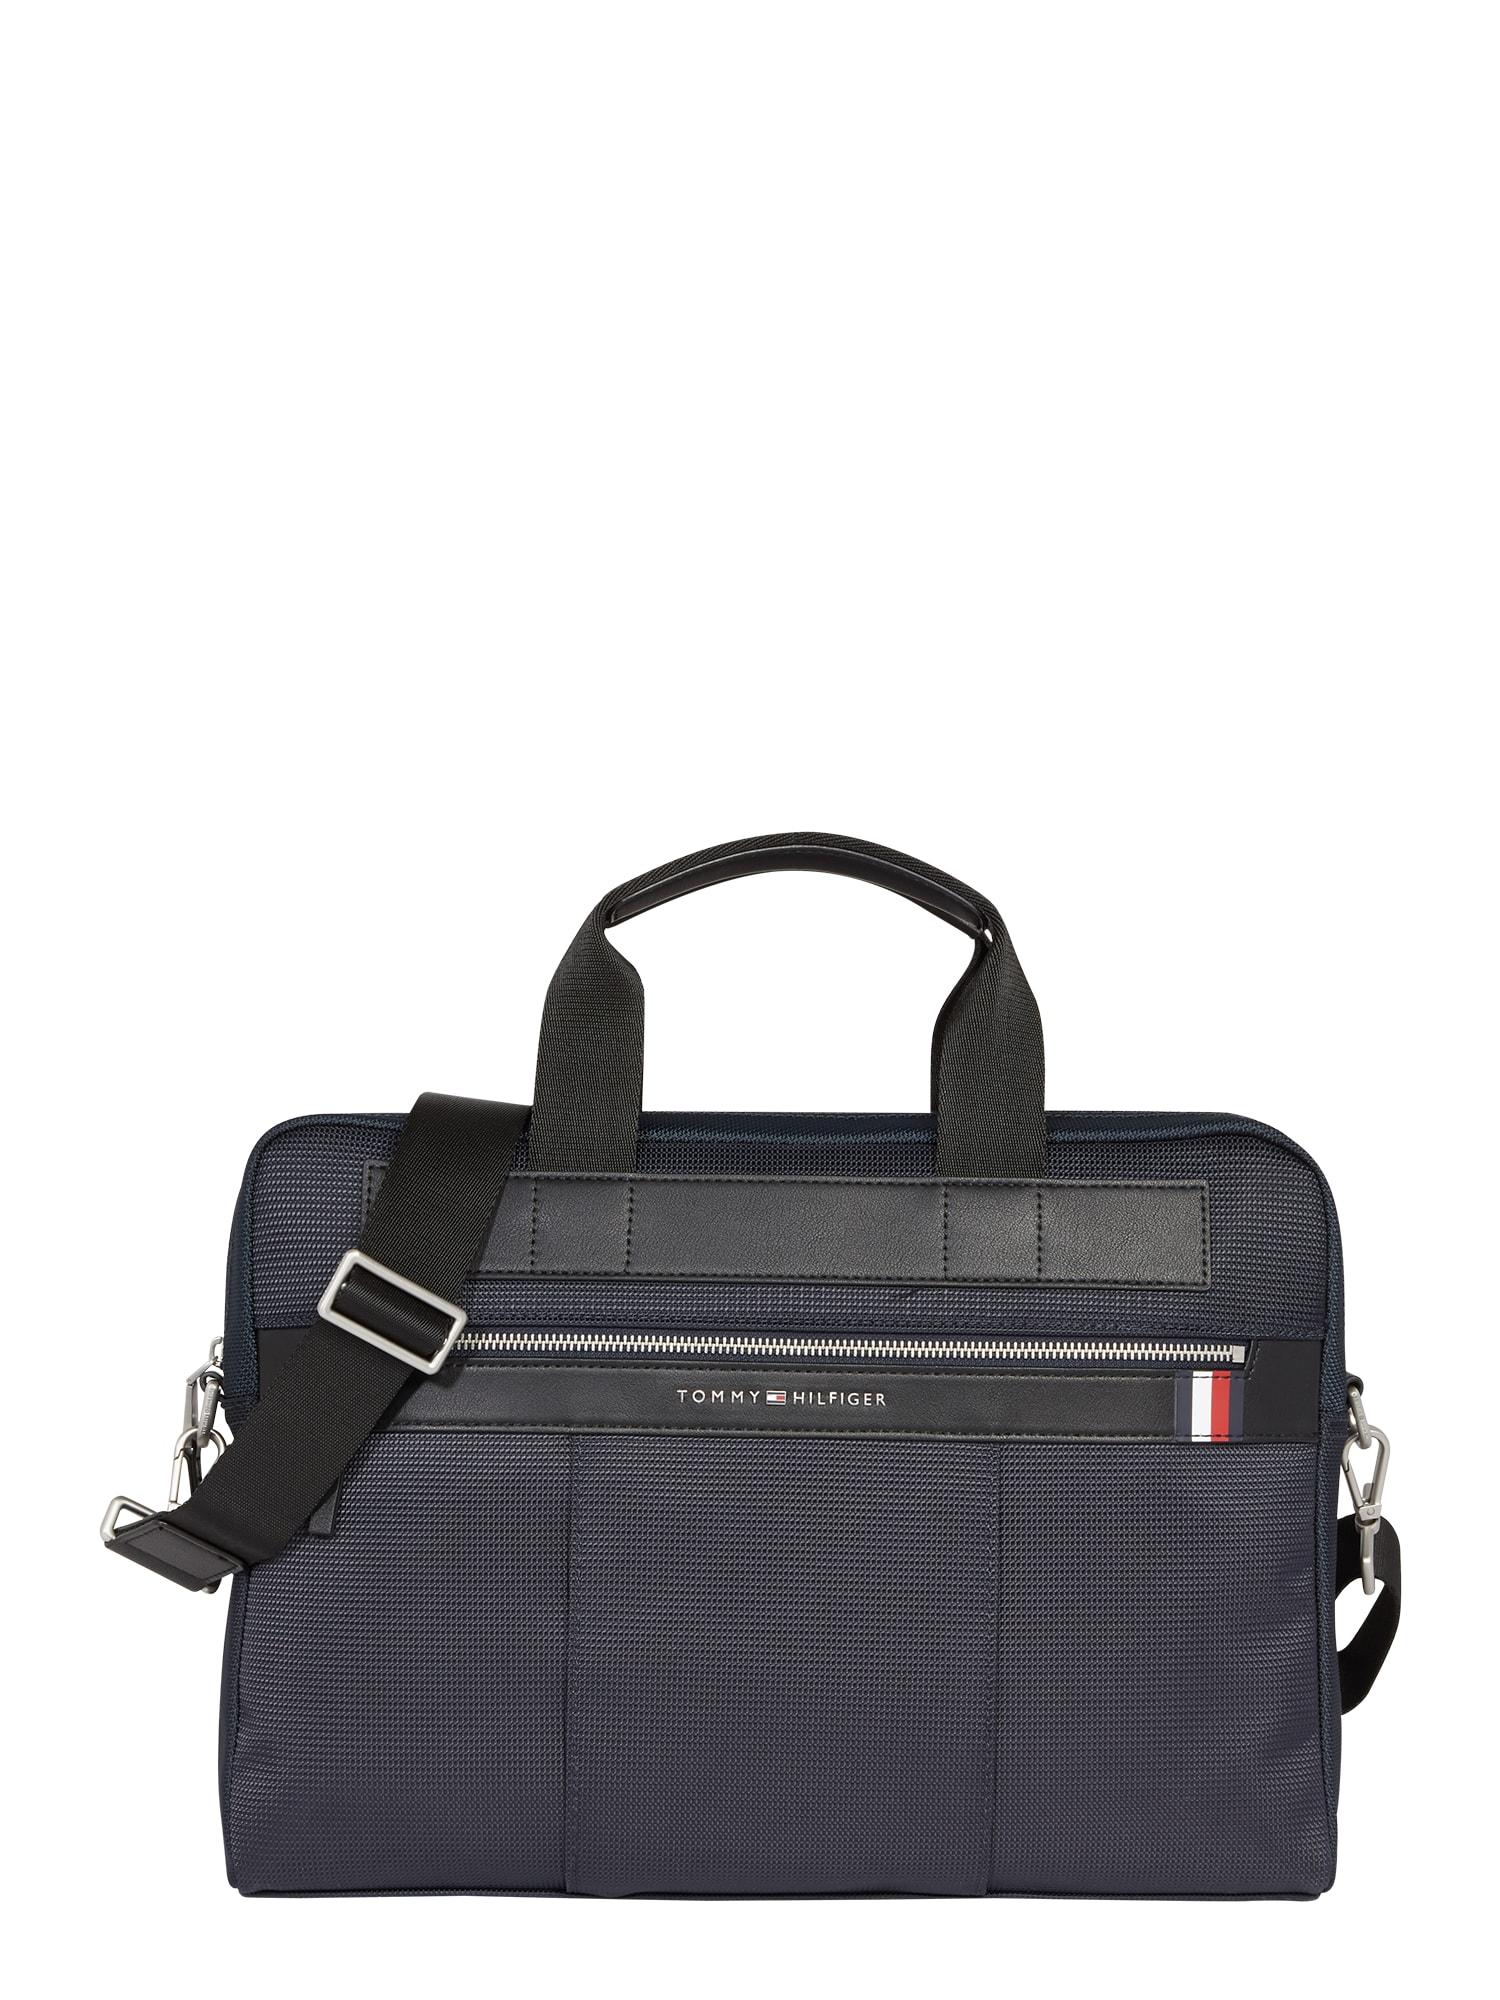 TOMMY HILFIGER Nešiojamojo kompiuterio krepšys tamsiai mėlyna